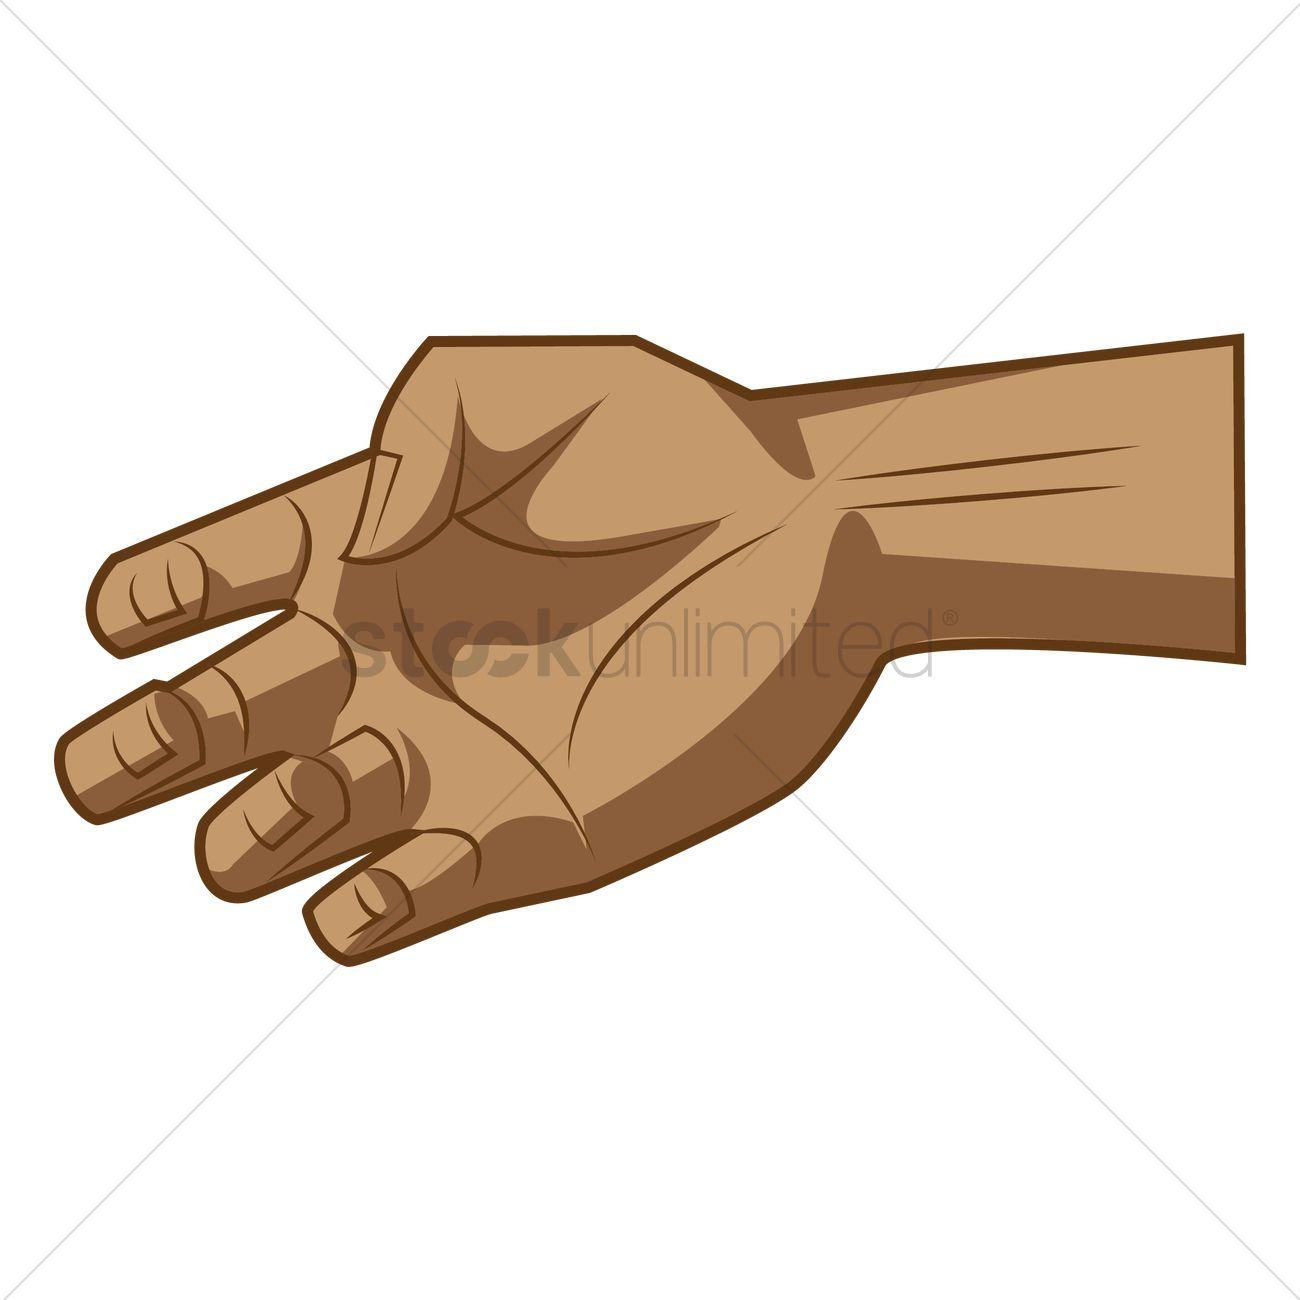 grab hand vector image 1459056 stockunlimited